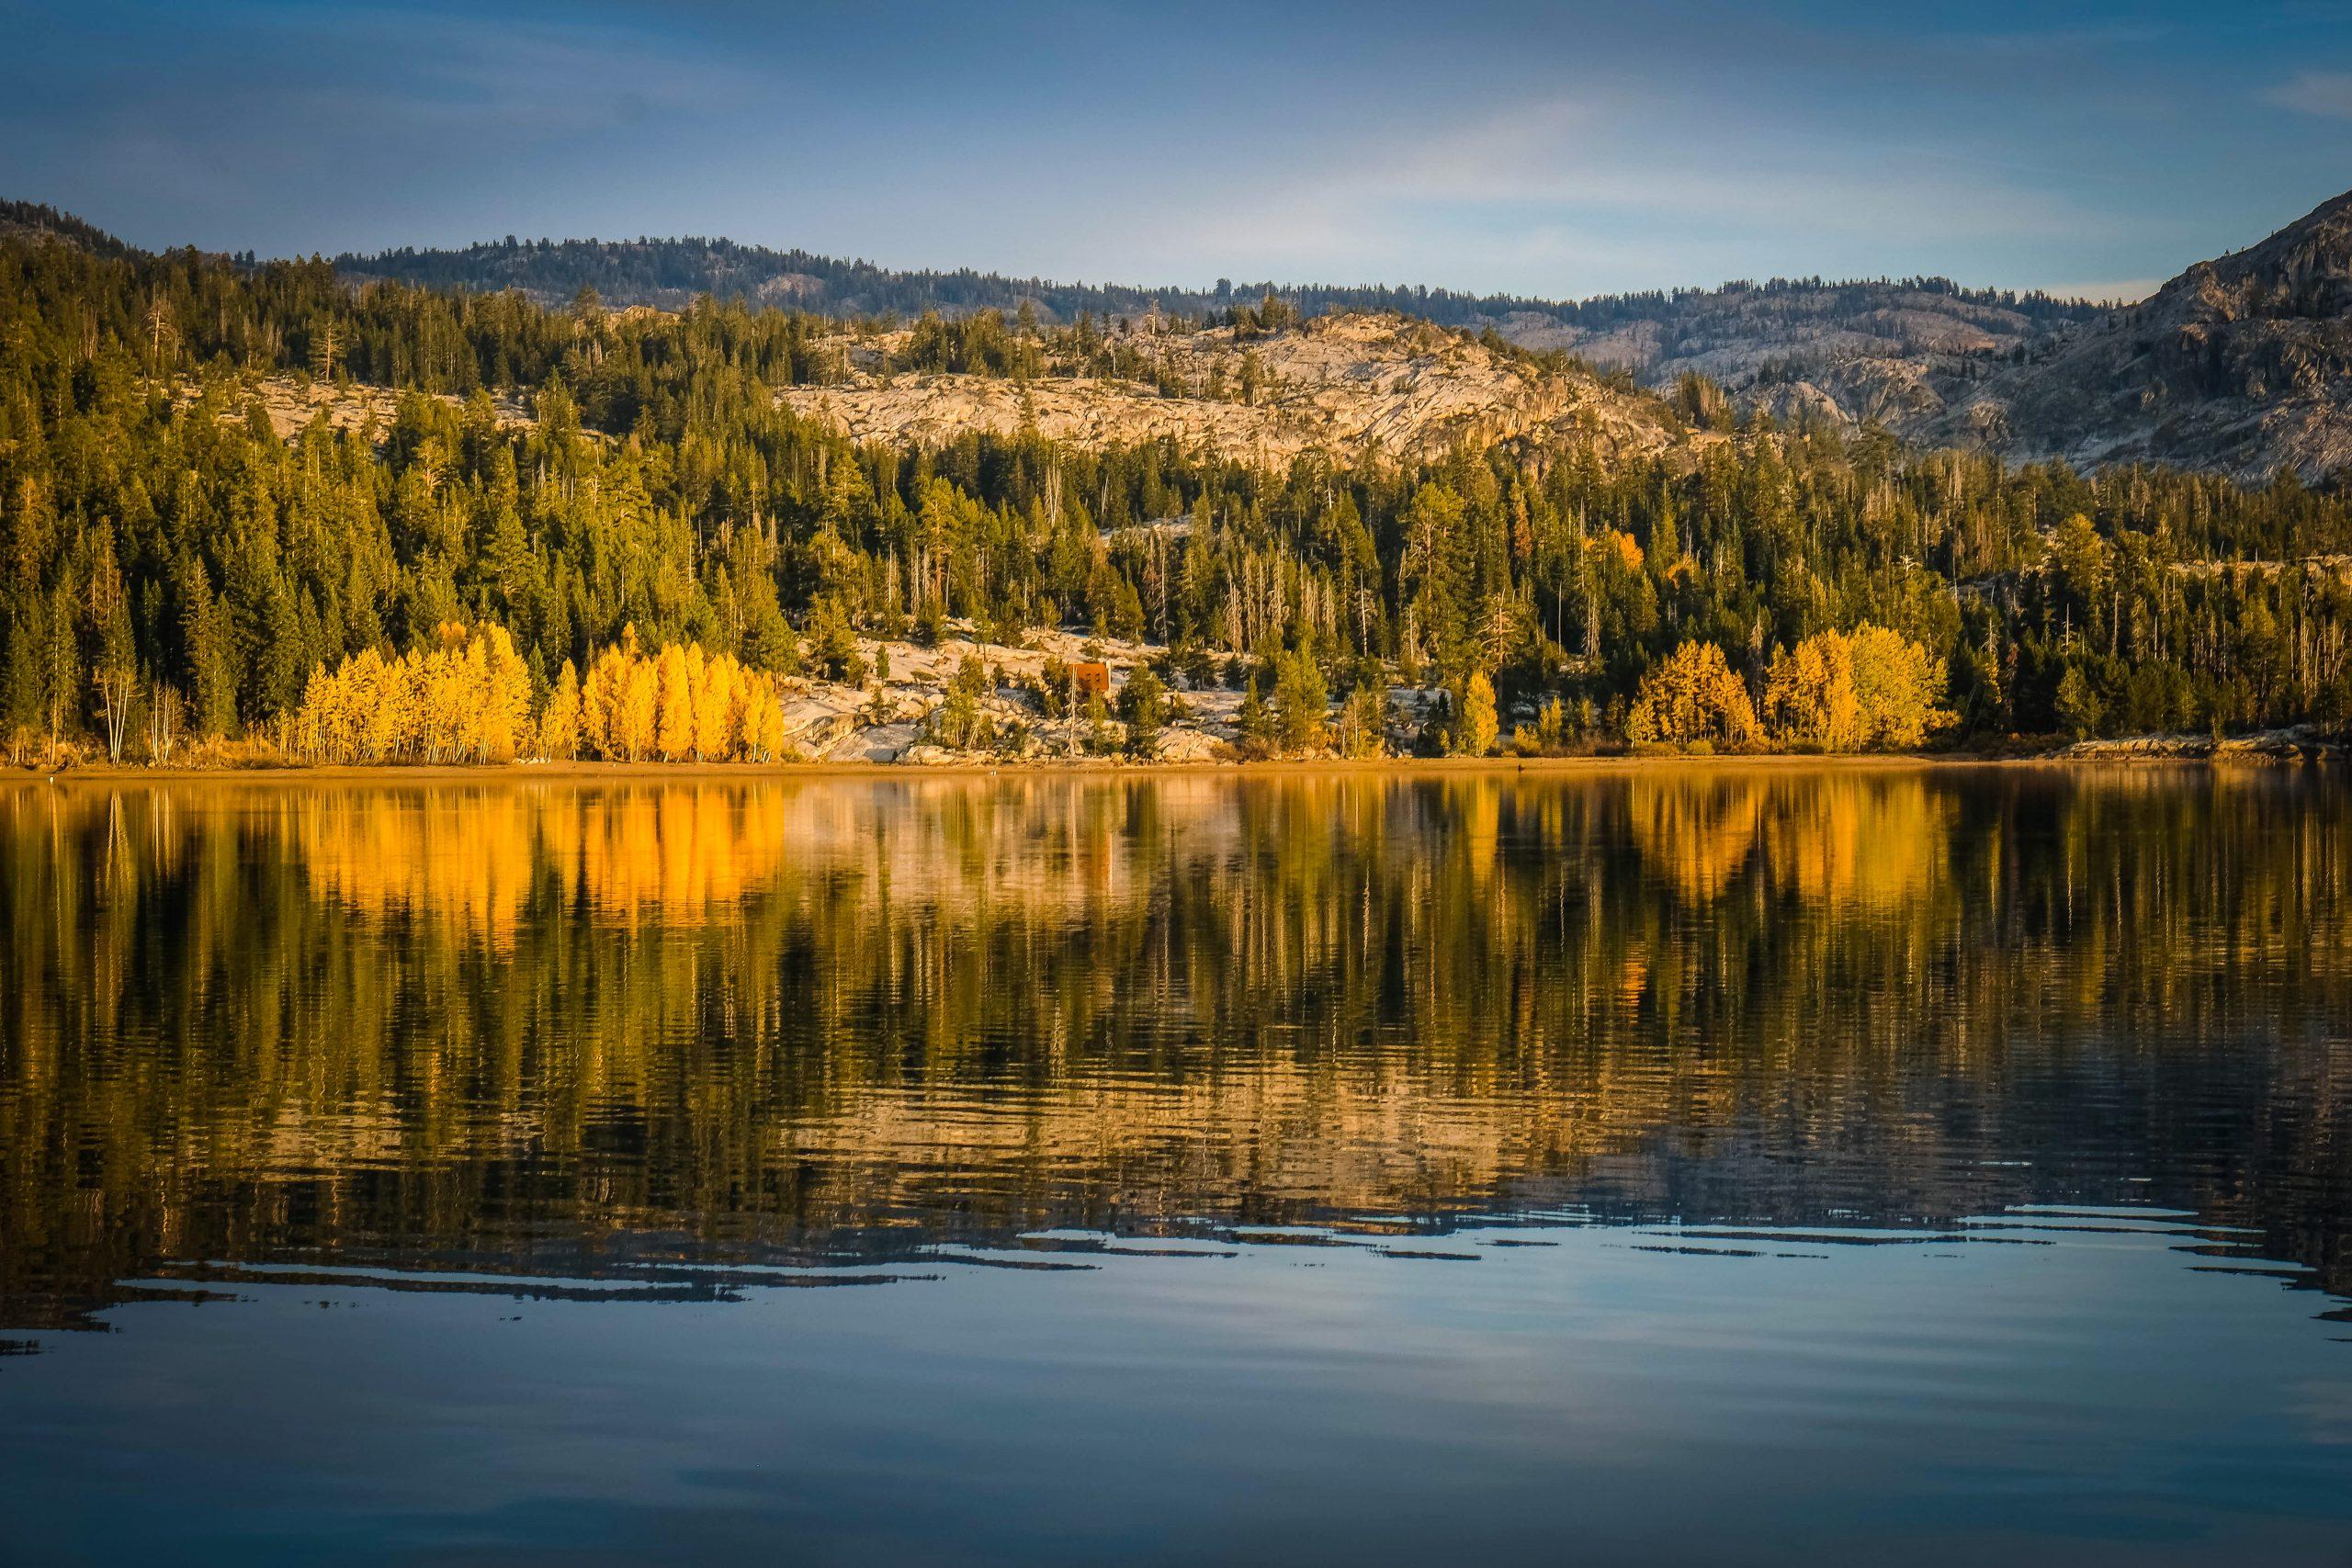 california-reflections-fiona-madden-photography